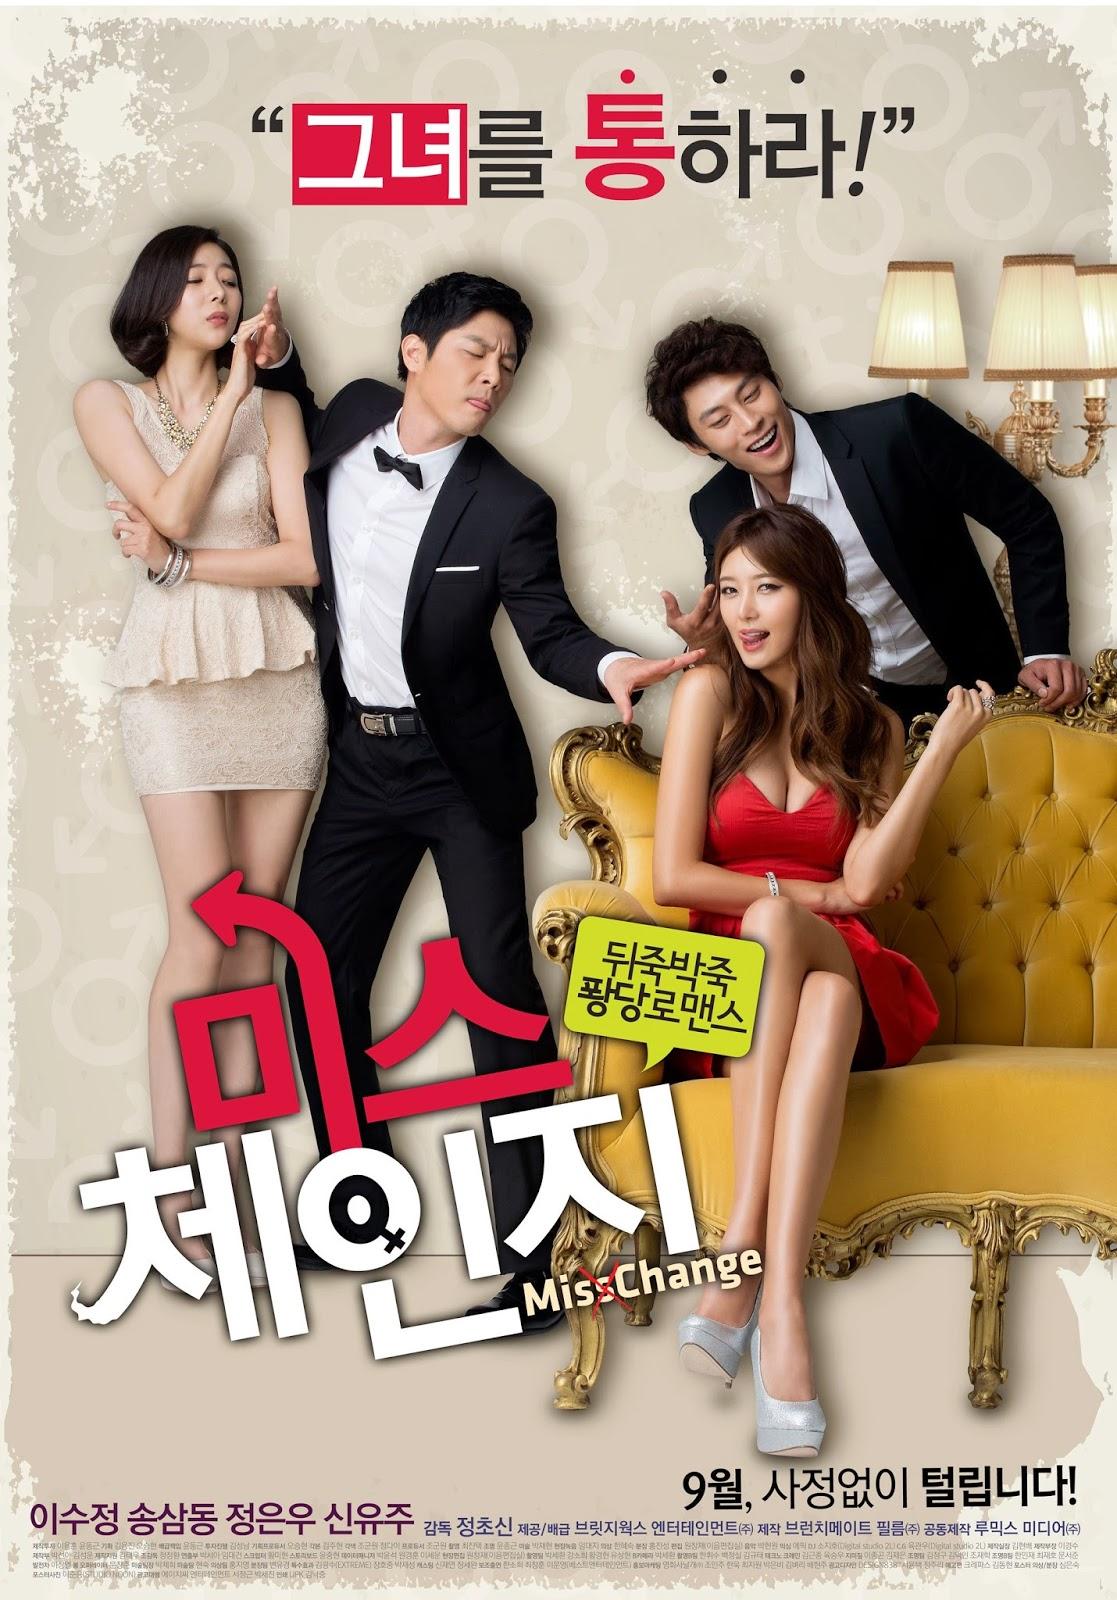 Download Miss Change (2013)